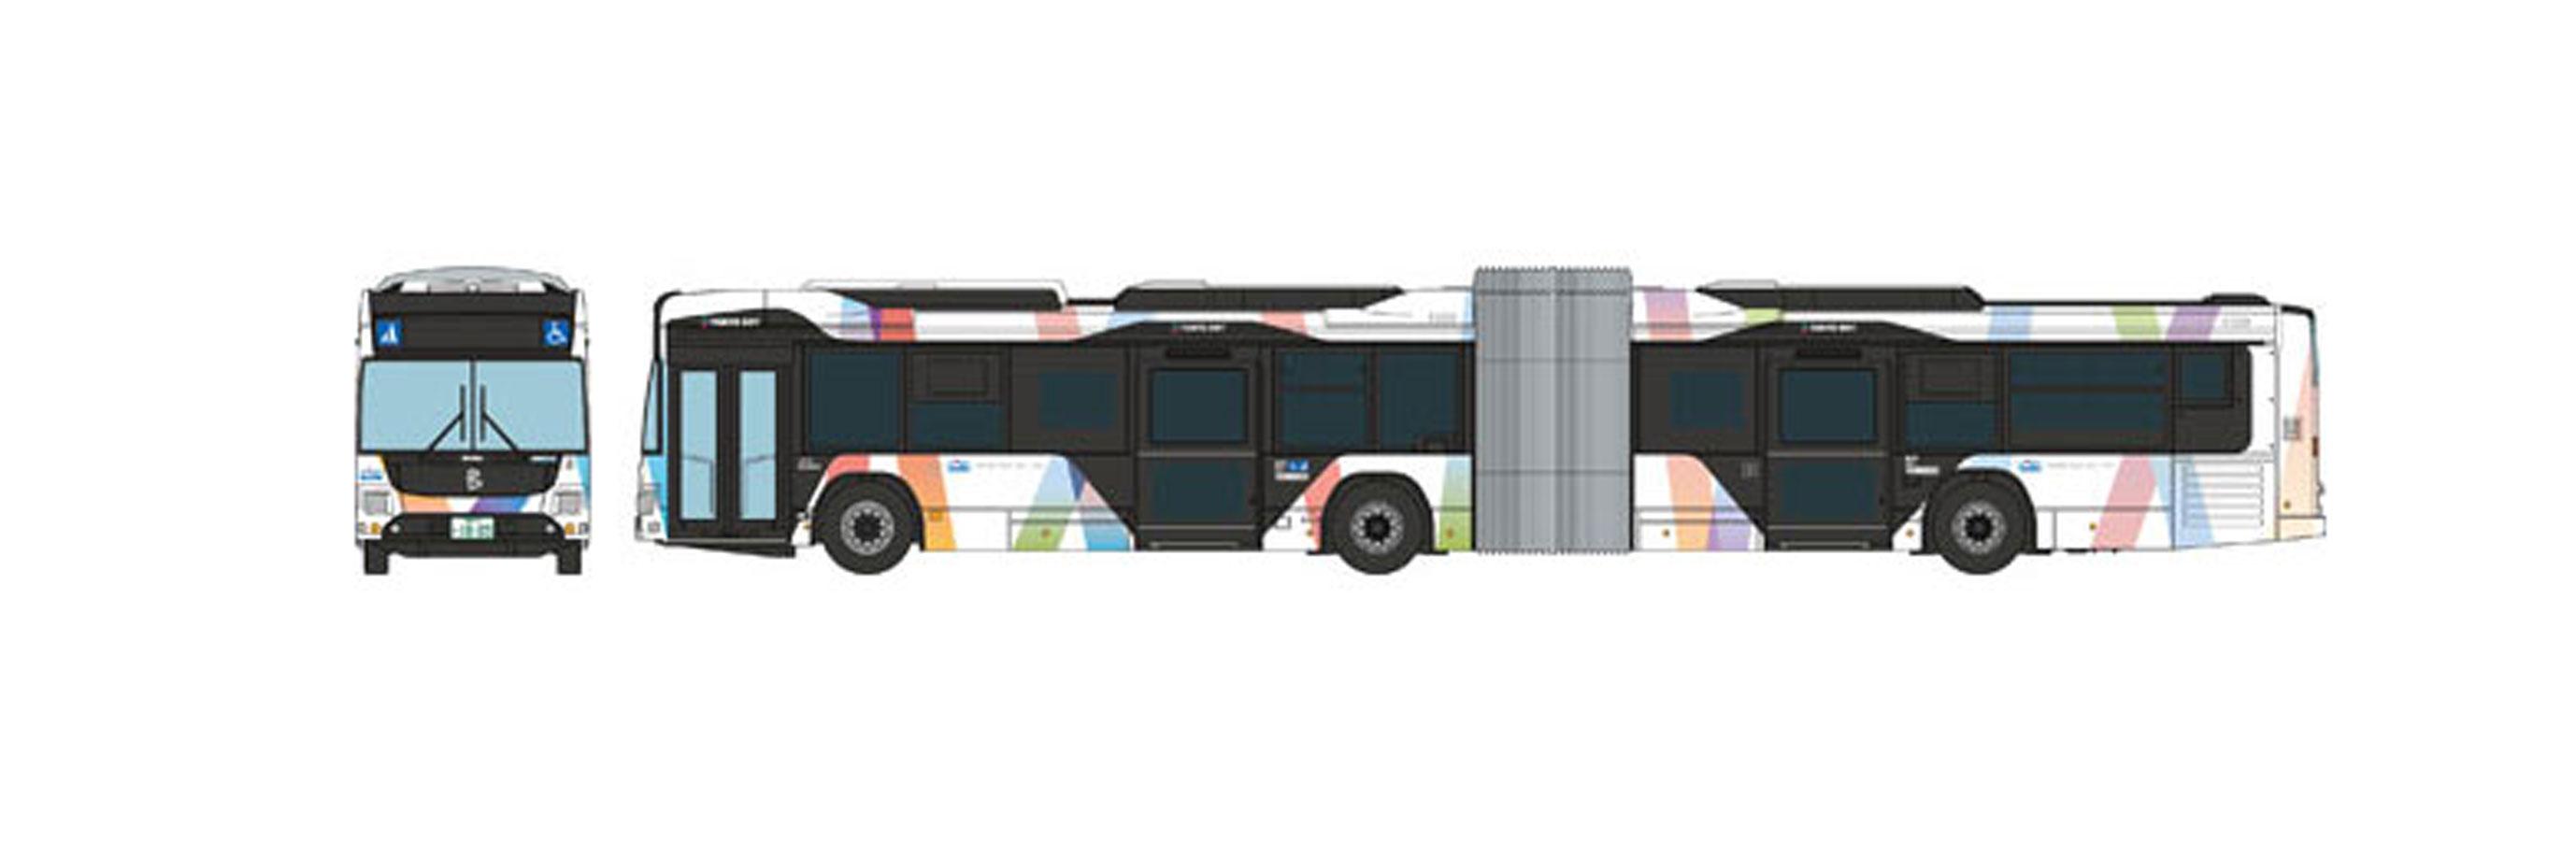 Keisei Bus Tokyo BRT Articulated Bus